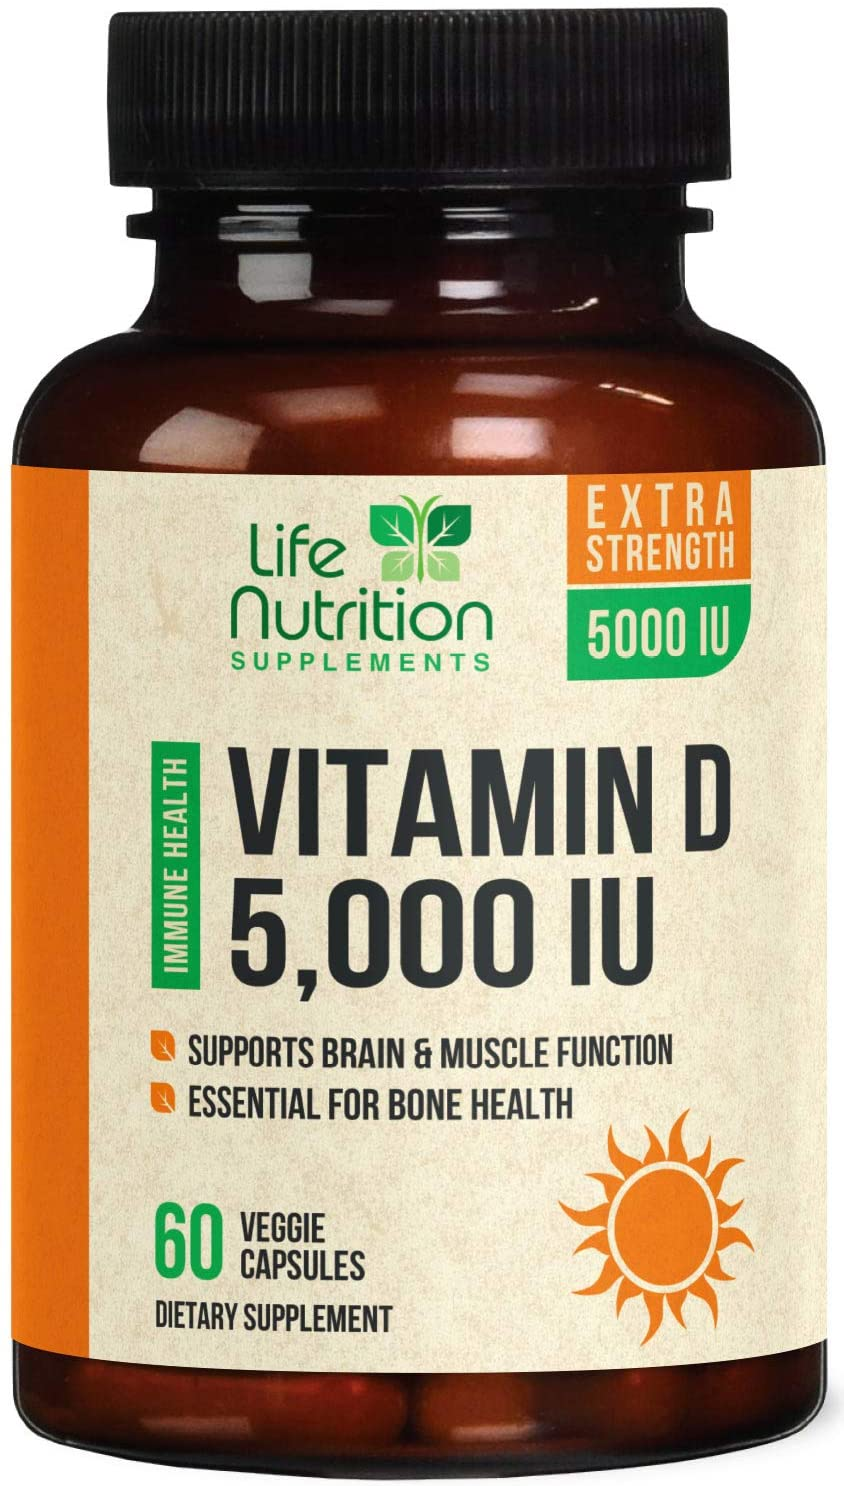 Vitamin D - Extra Strength Vitamin D3 5000 IU / 125mcg, Made in USA, Bone Supplement Pills for Teeth, Heart & Immune Support for Men & Women - Non-GMO - 60 Capsules